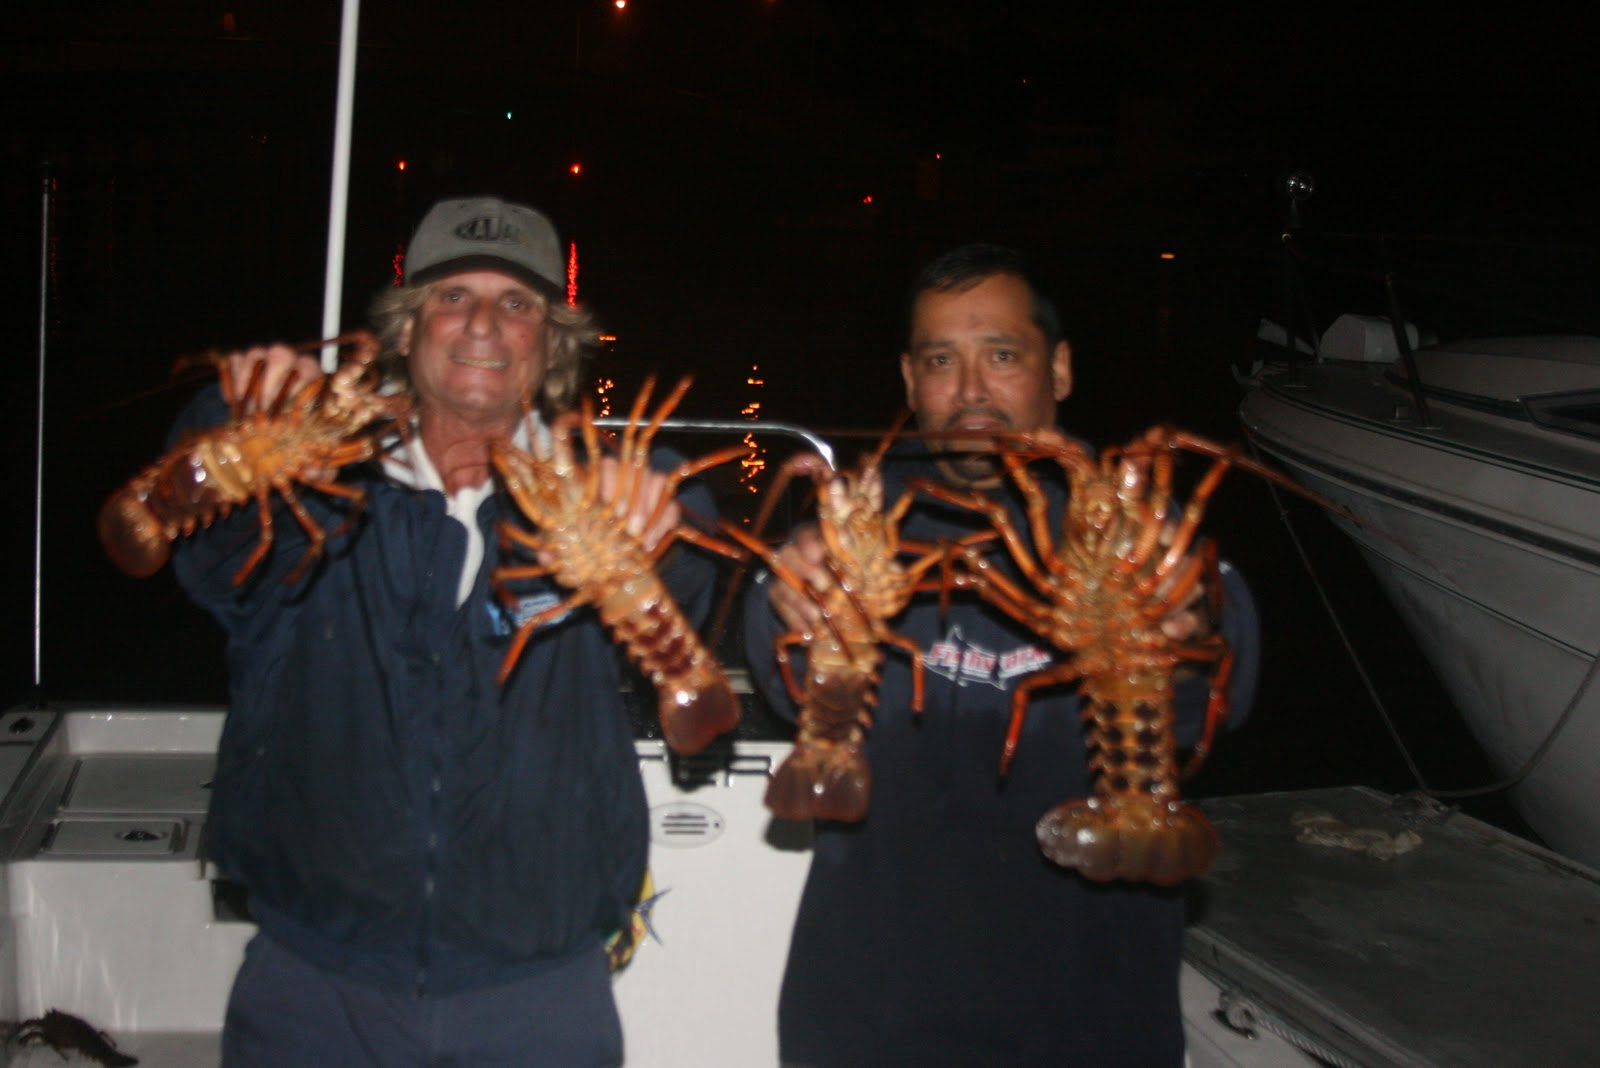 Dan 39 s journal lobster fishing last night in long beach for Sport fishing with dan hernandez